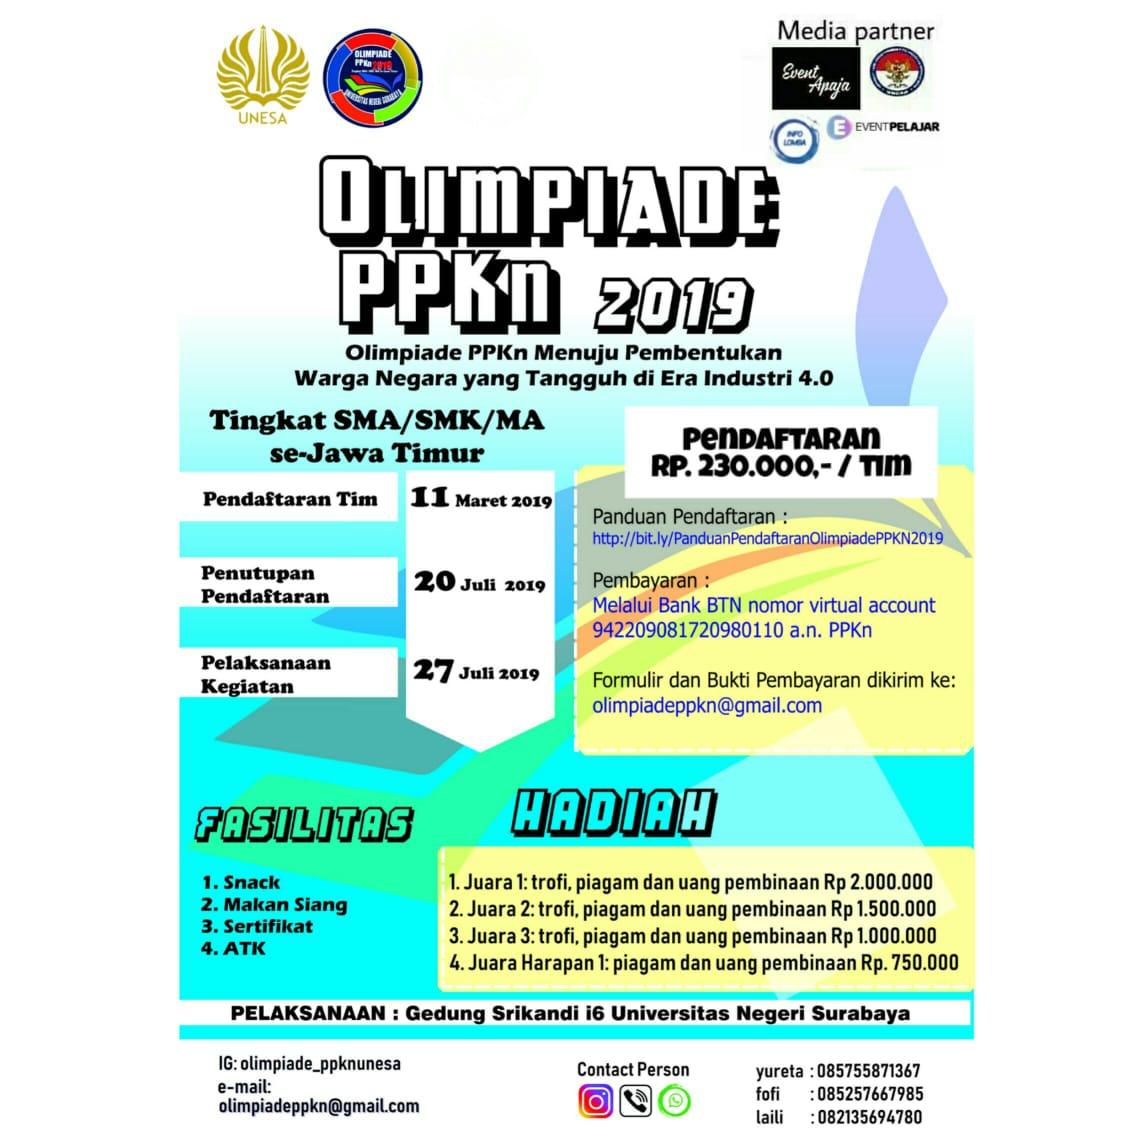 Olimpiade PPKn 2019 Tingkat SMA/SMK/MA UNESA